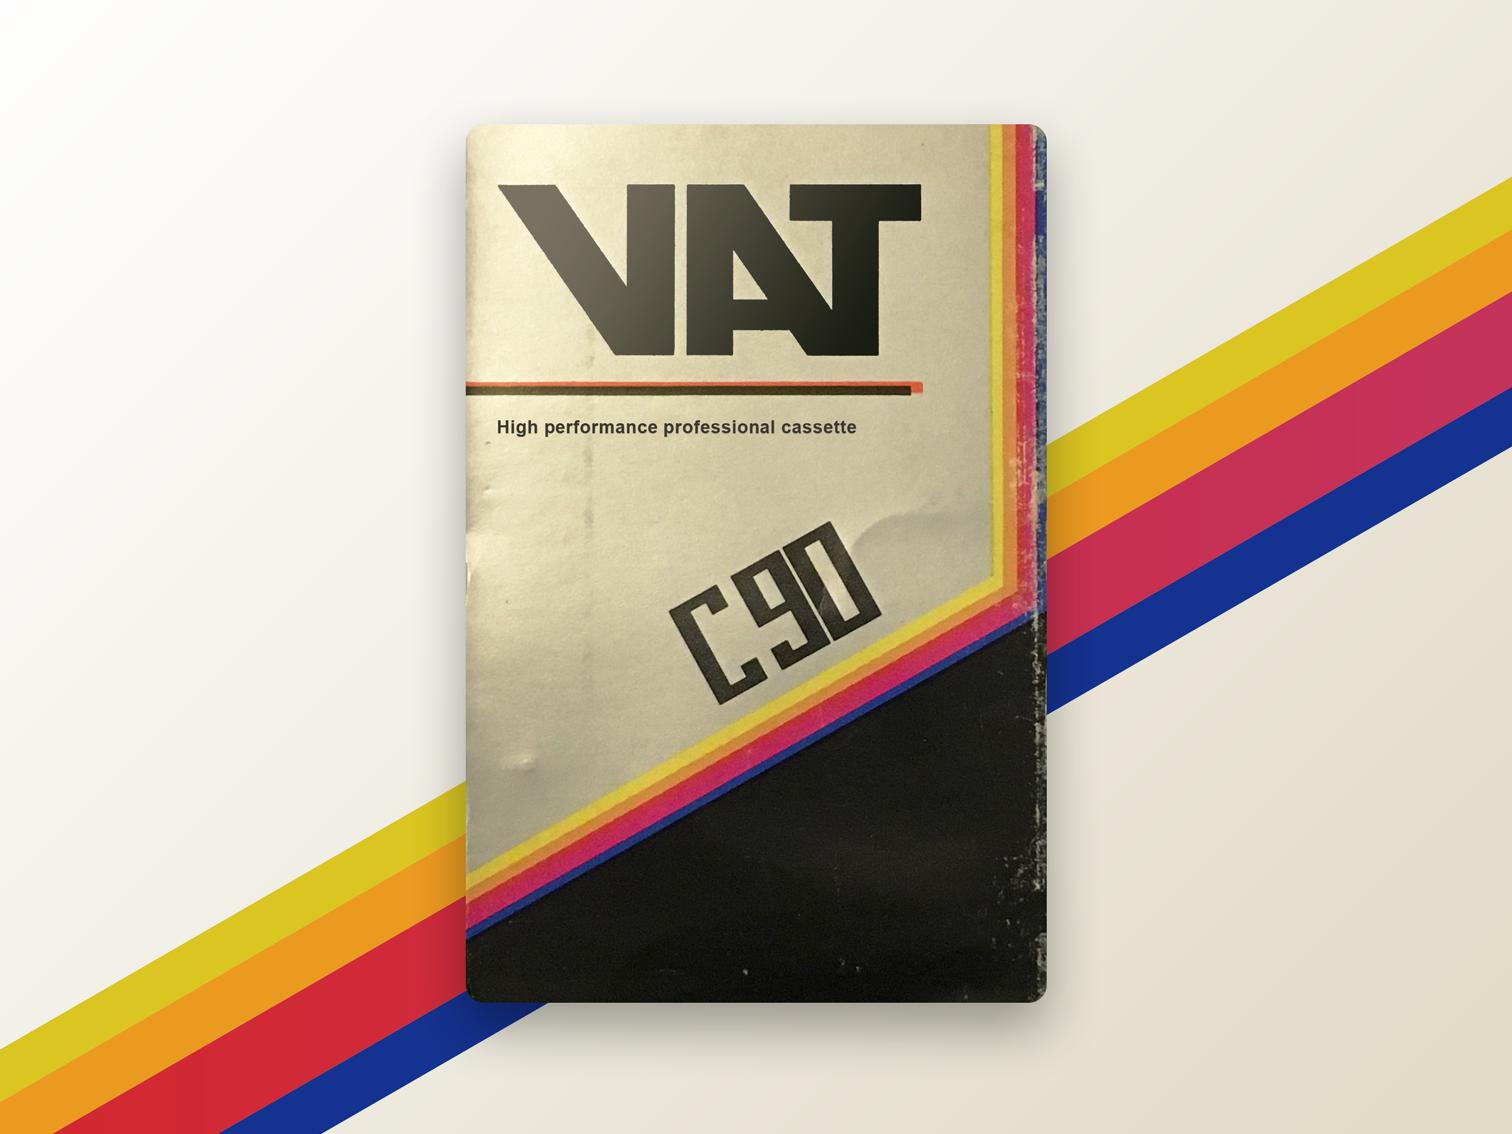 VAT c90 high performance cassette ui retro design inspiration retrowave design brand colors artwork retro vhs cassette tape cassette old school concept